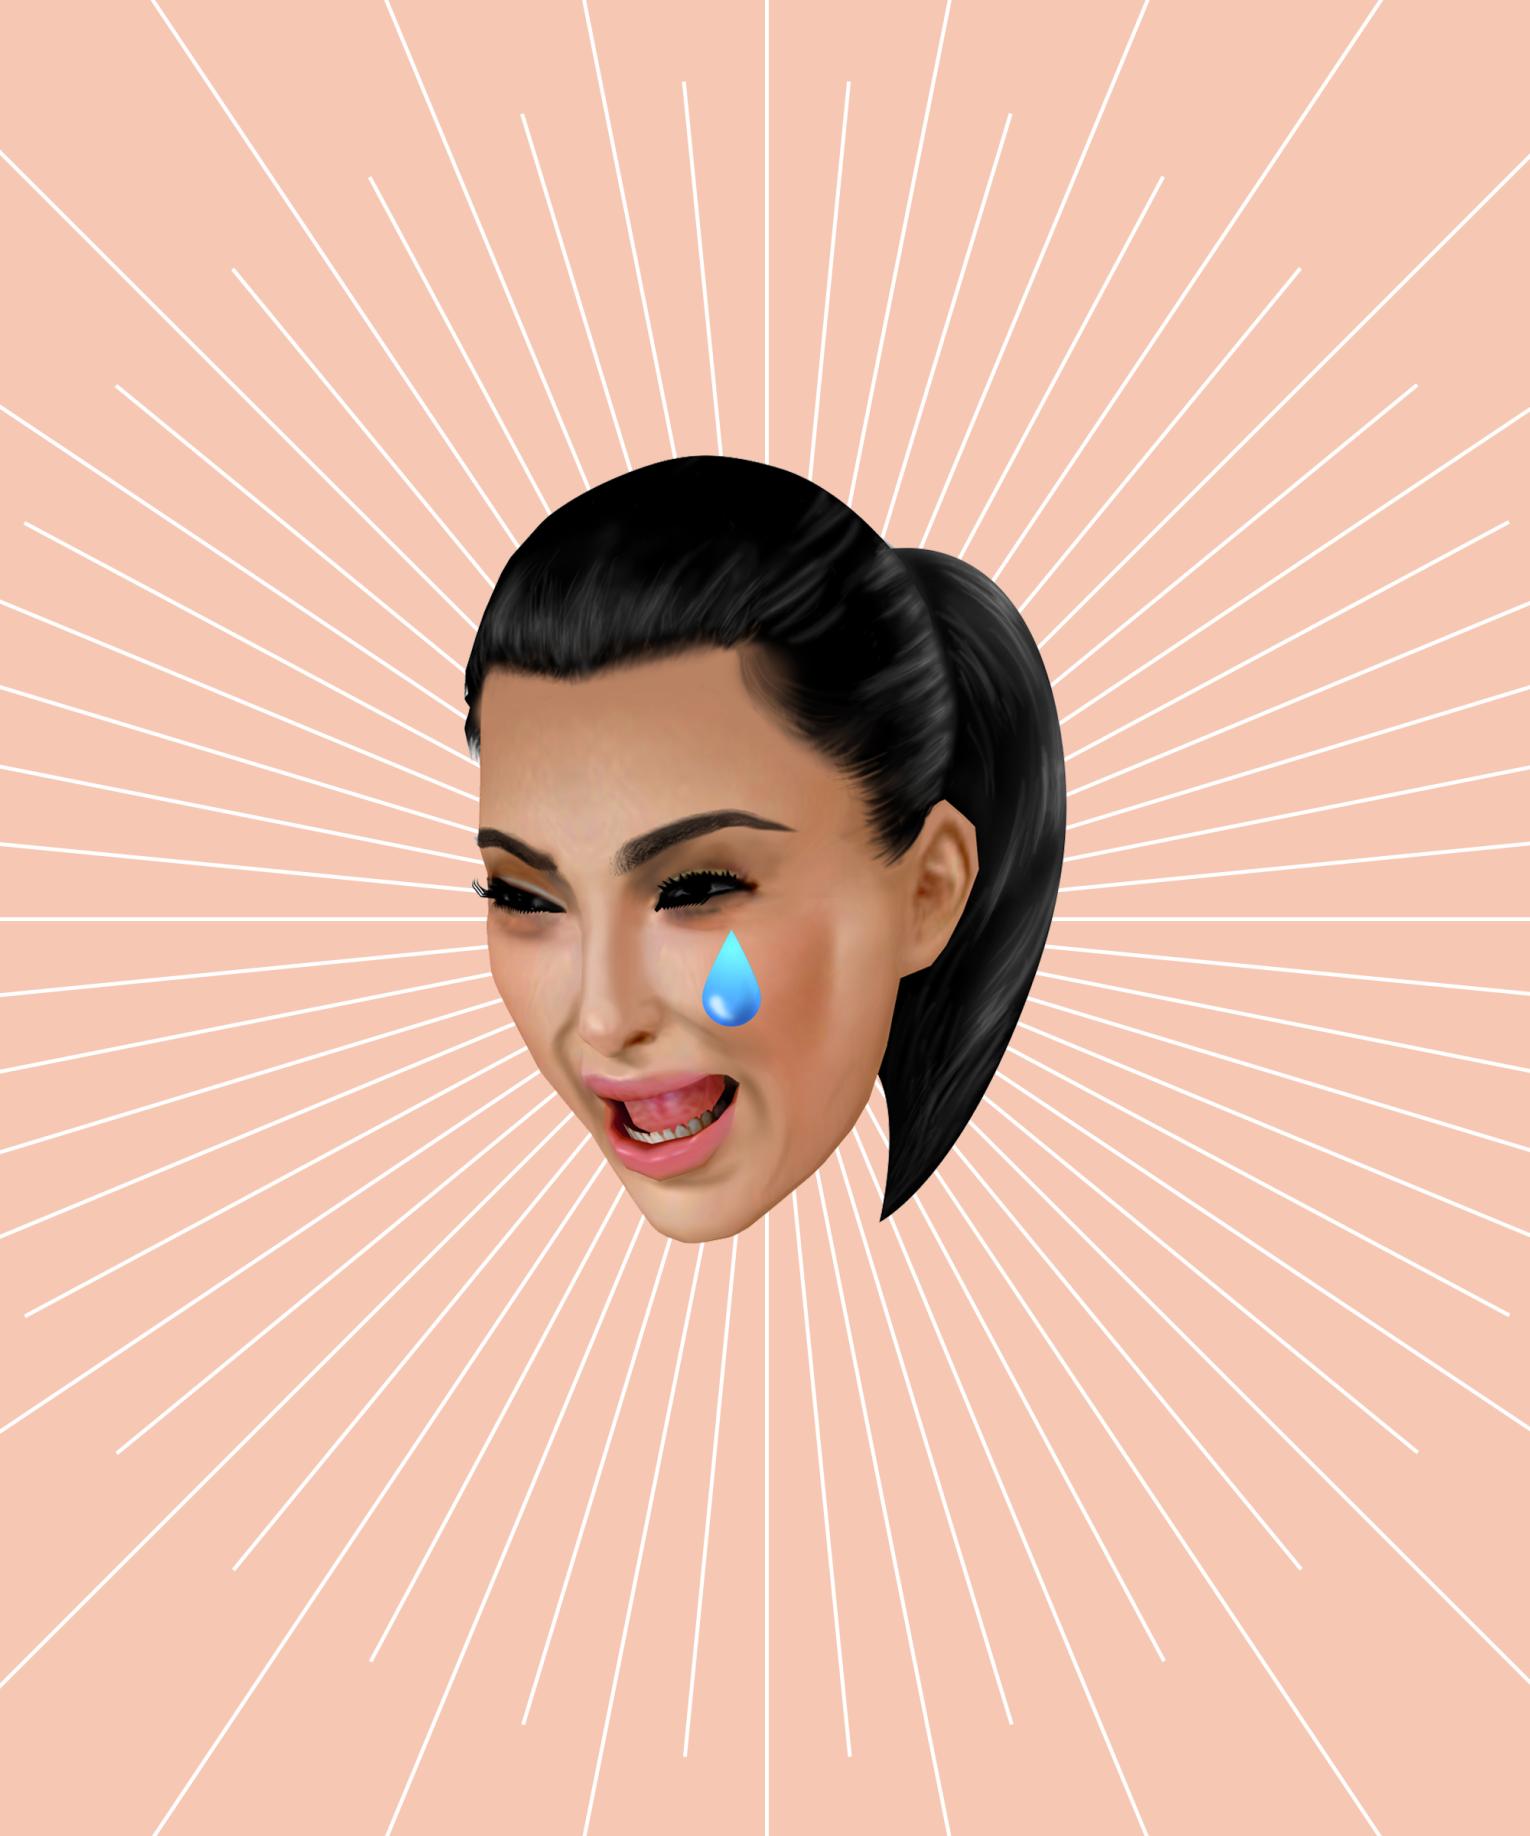 Brand new kimoji are coming soon coffee break kim - Ugly face wallpaper ...